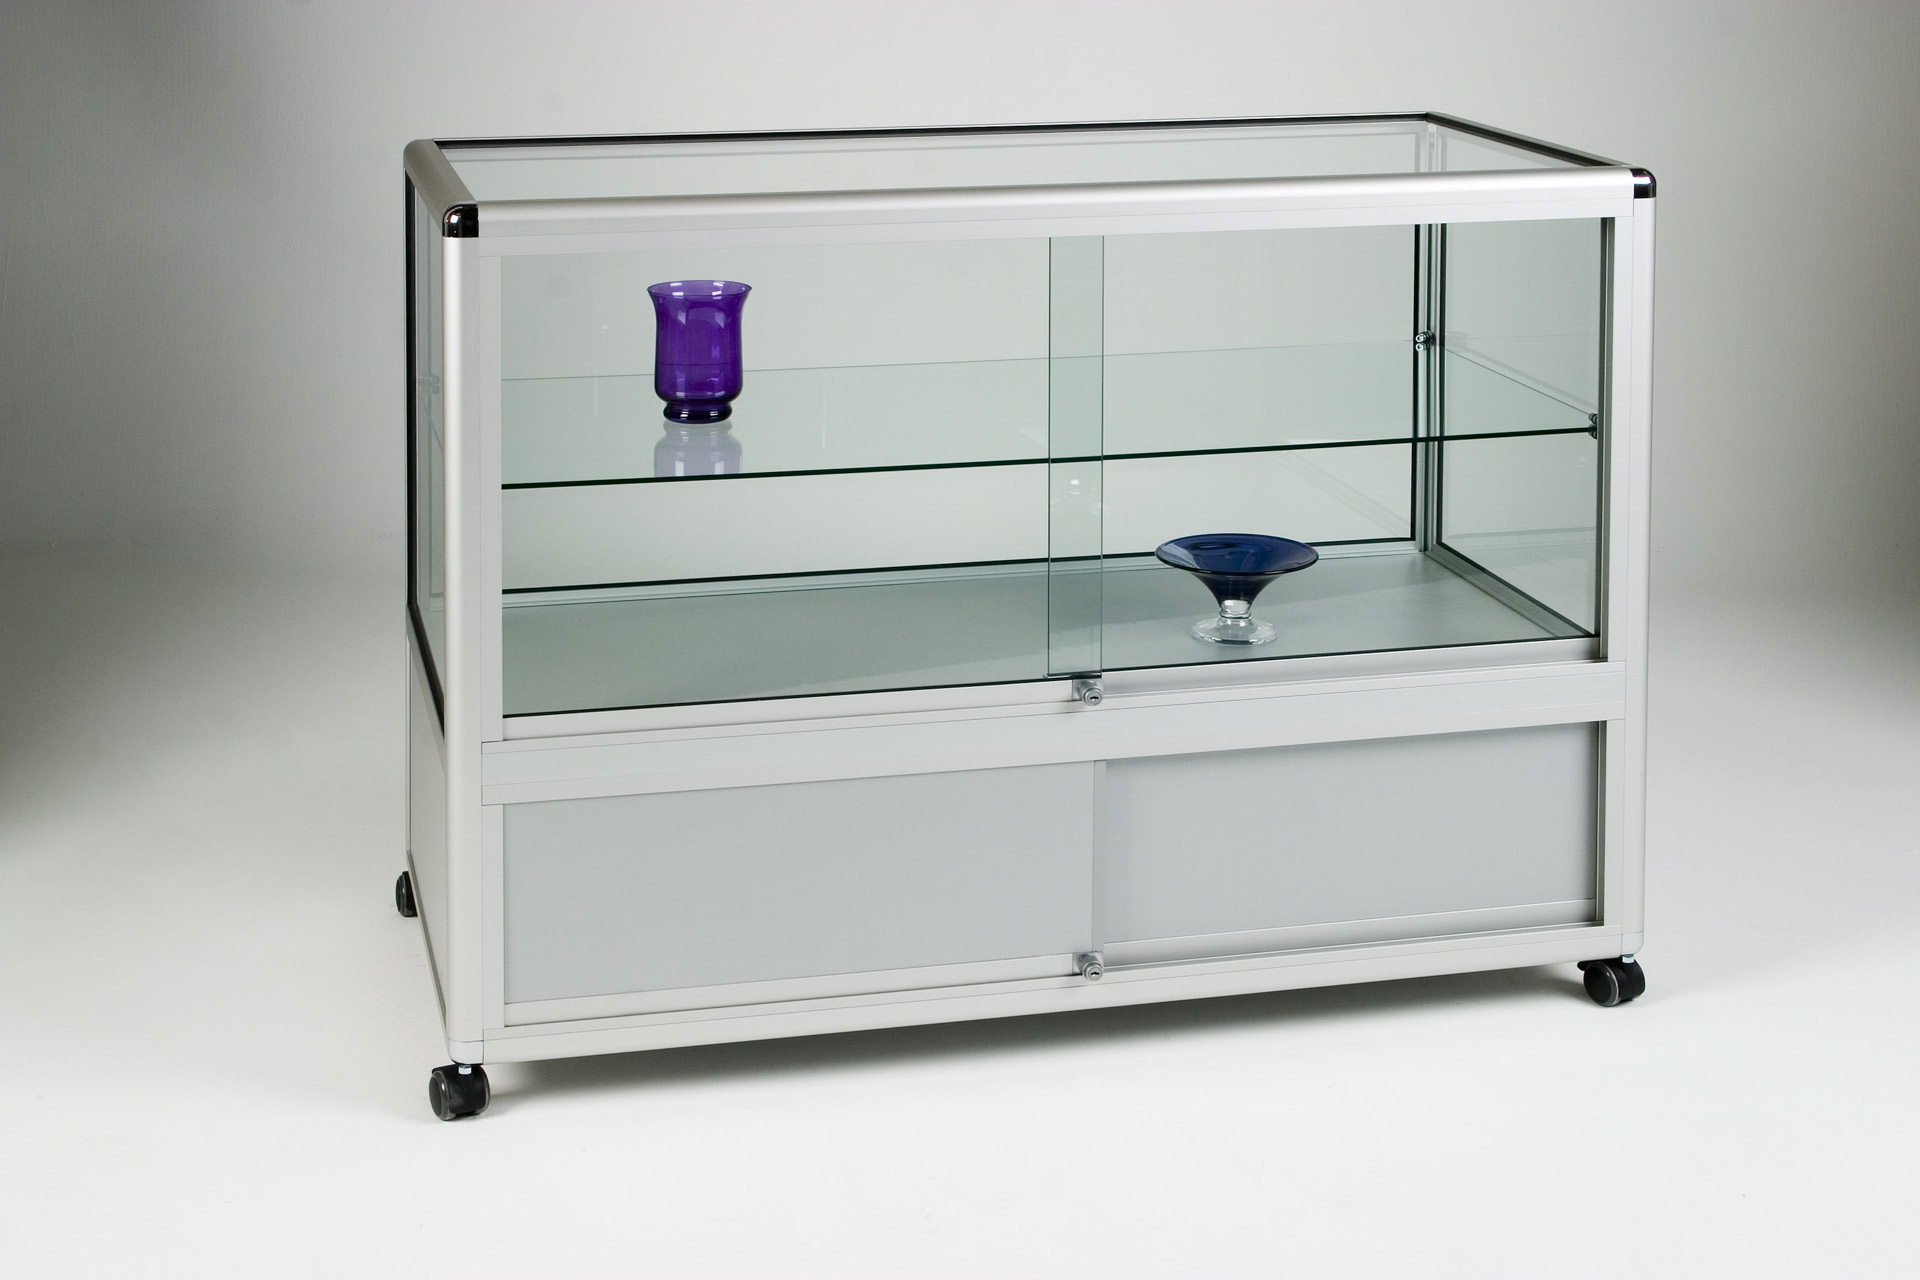 13_Straight Display counter 2:3.jpg